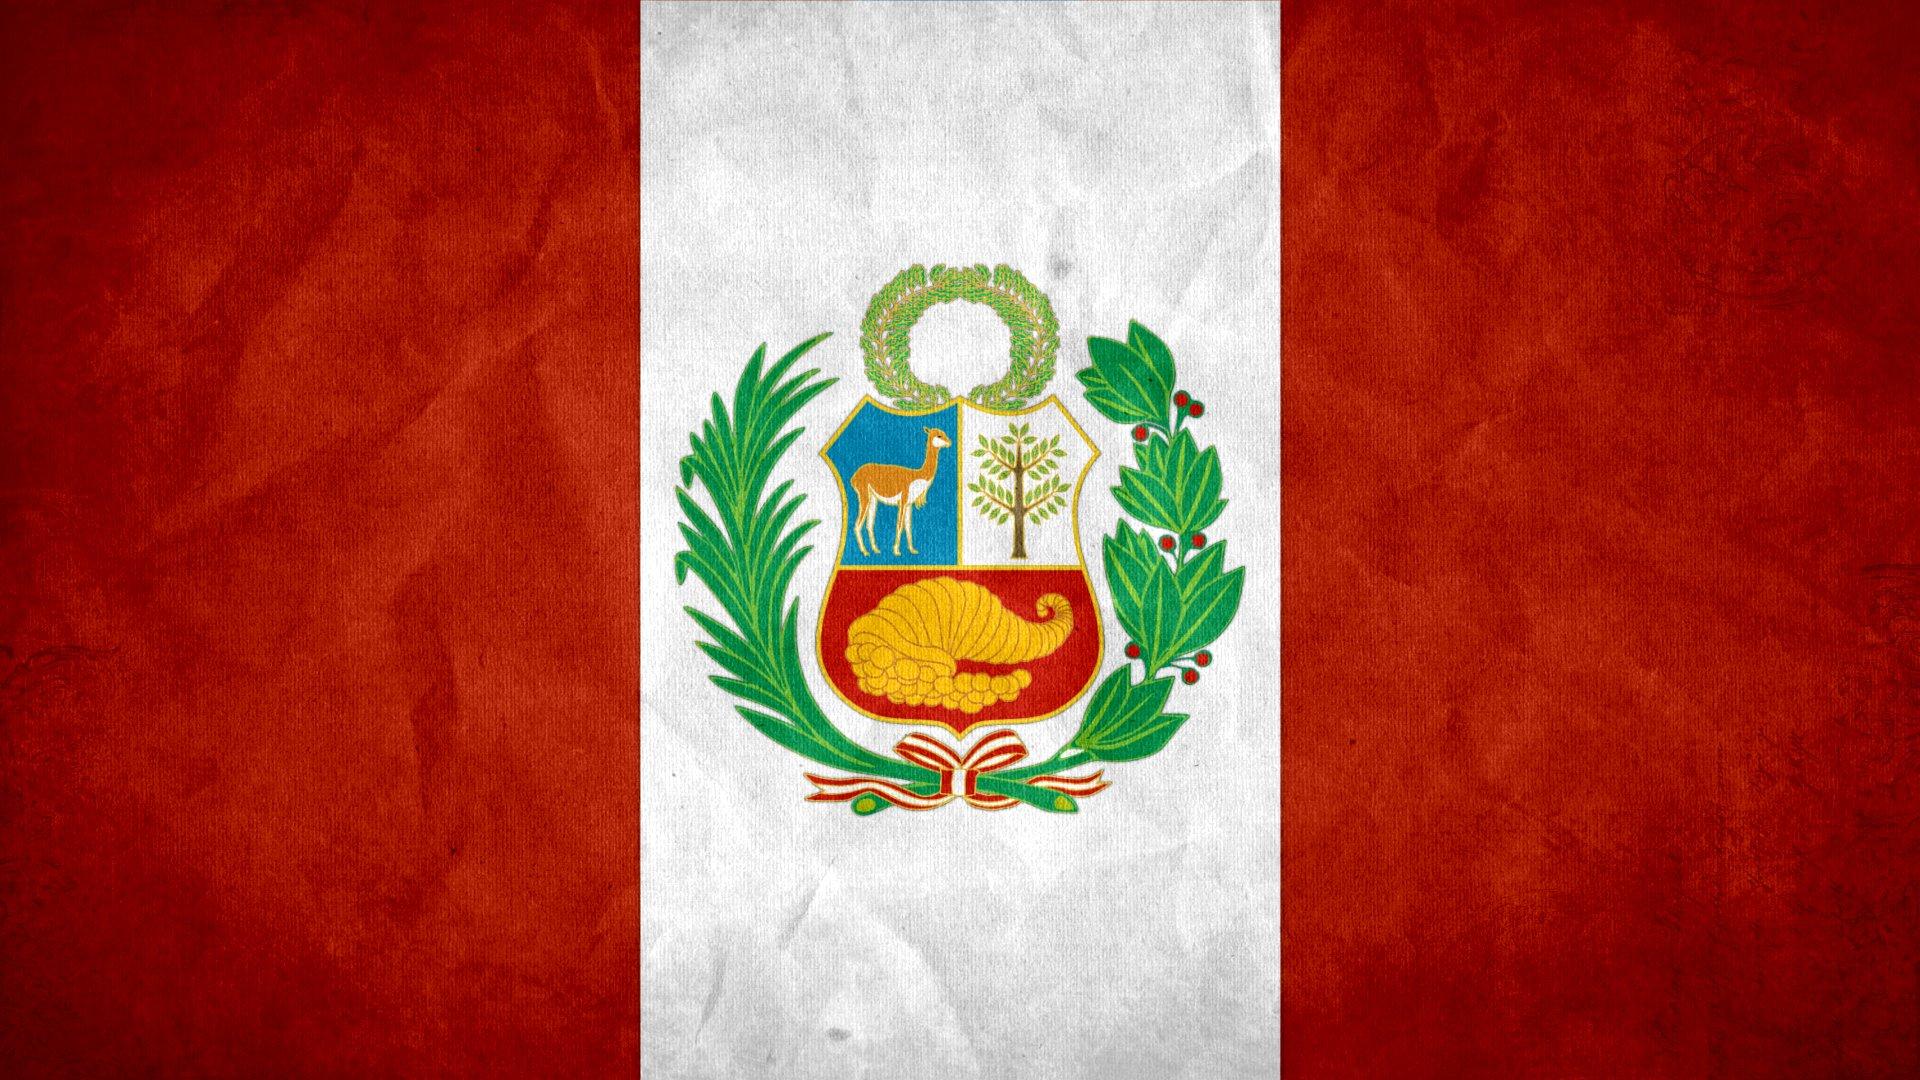 Flag Of Peru Fondo De Pantalla Hd Fondo De Escritorio 1920x1080 Id 1026641 Wallpaper Abyss